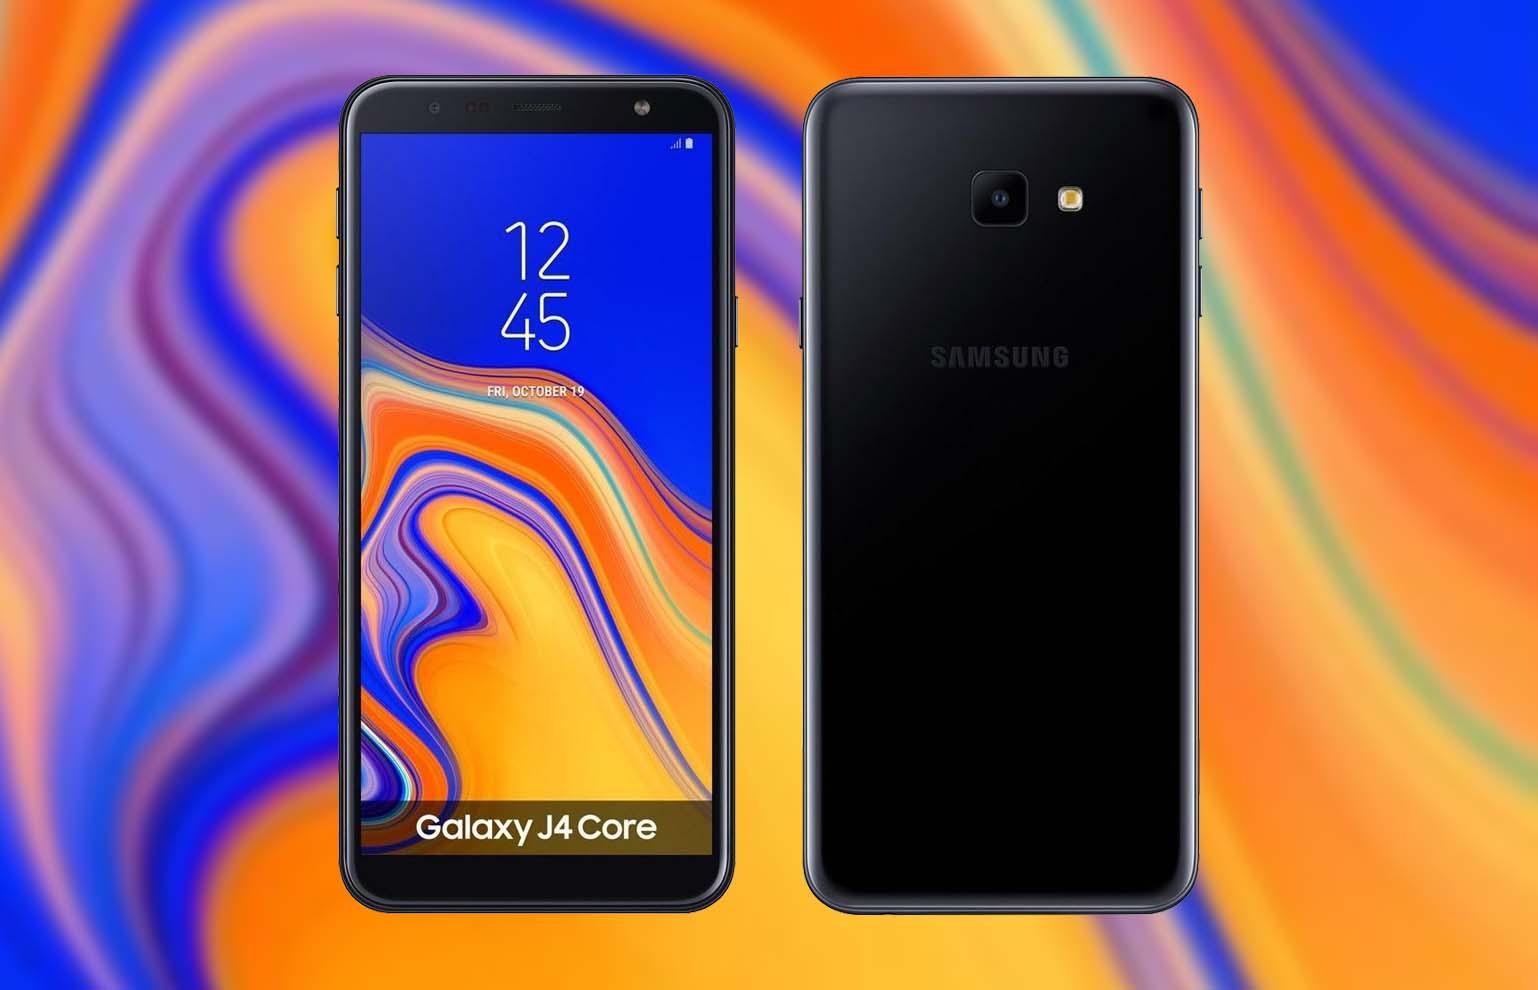 diseño samsung galaxy j4 core